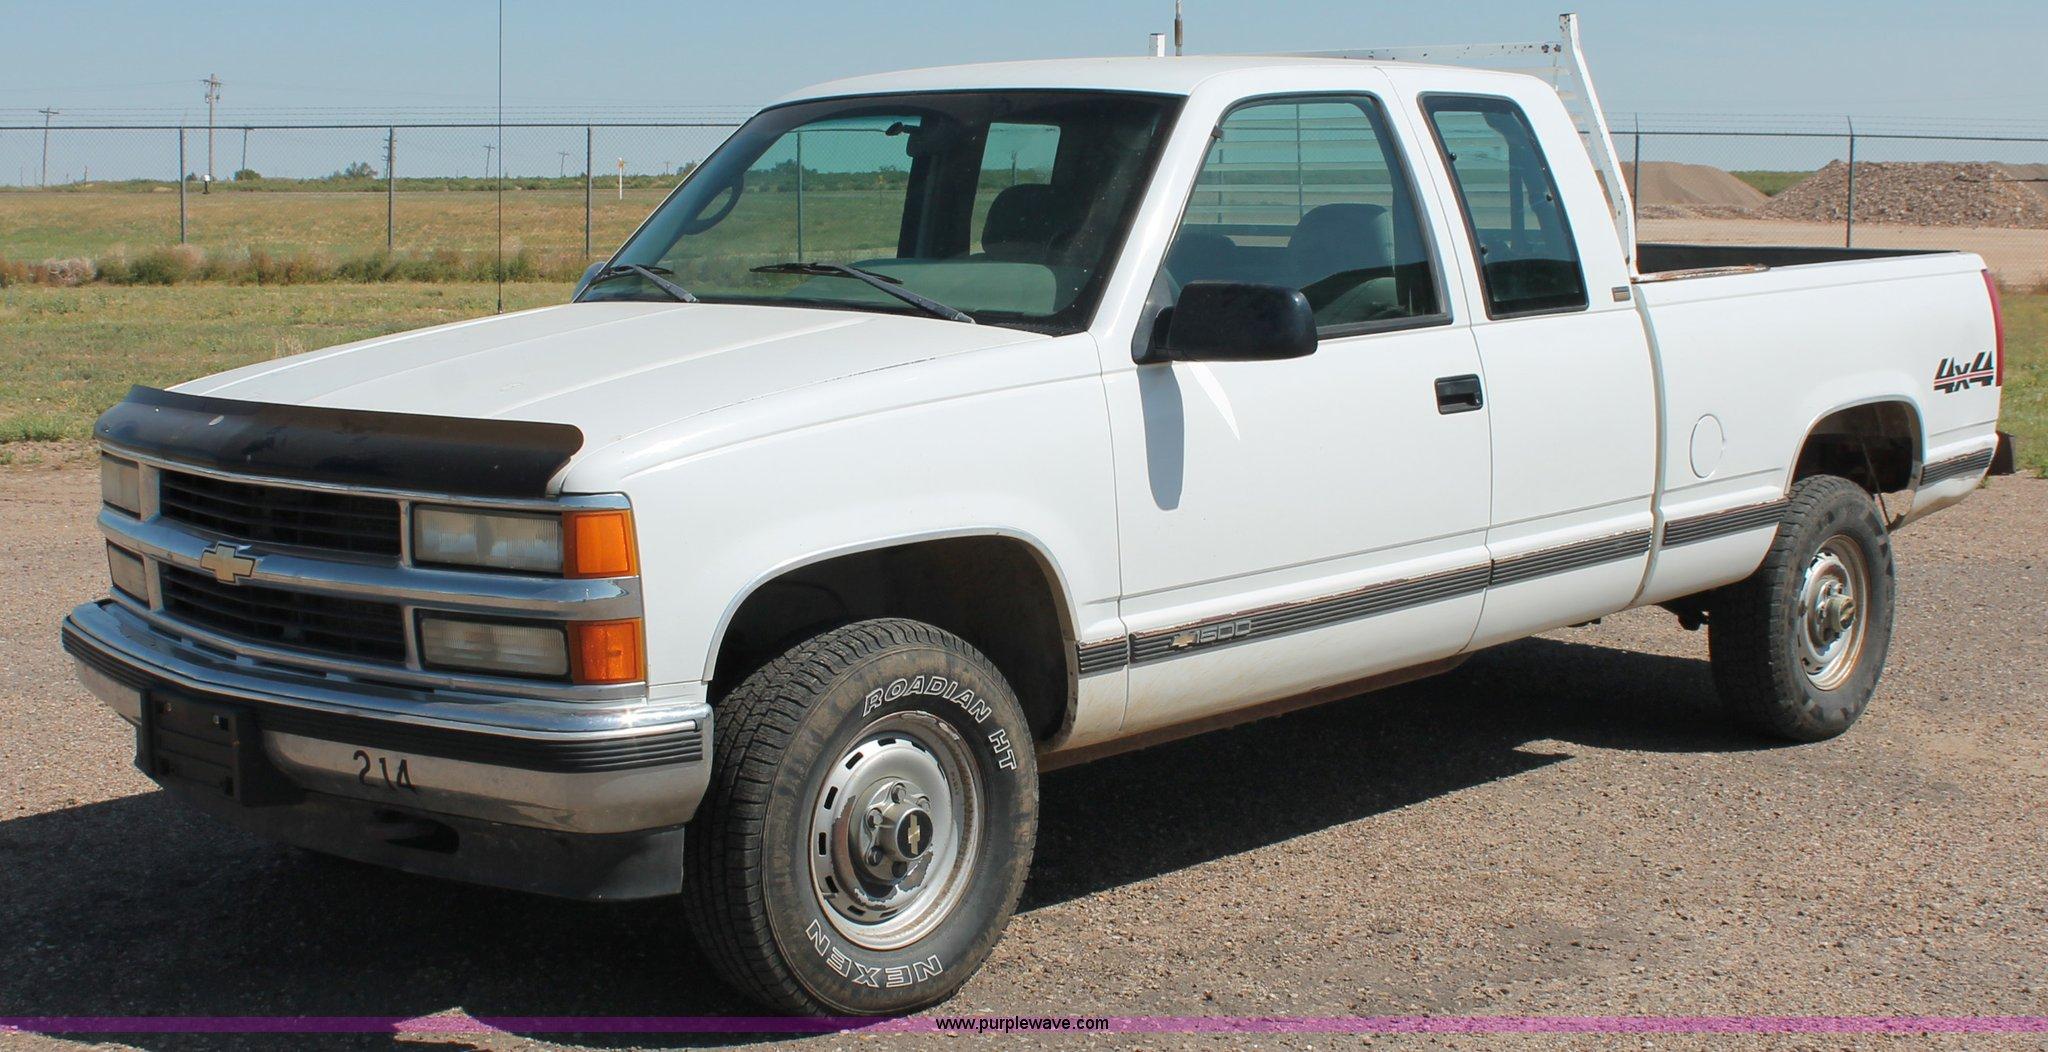 1995 Chevrolet Silverado 1500 Extended Cab Pickup Truck It